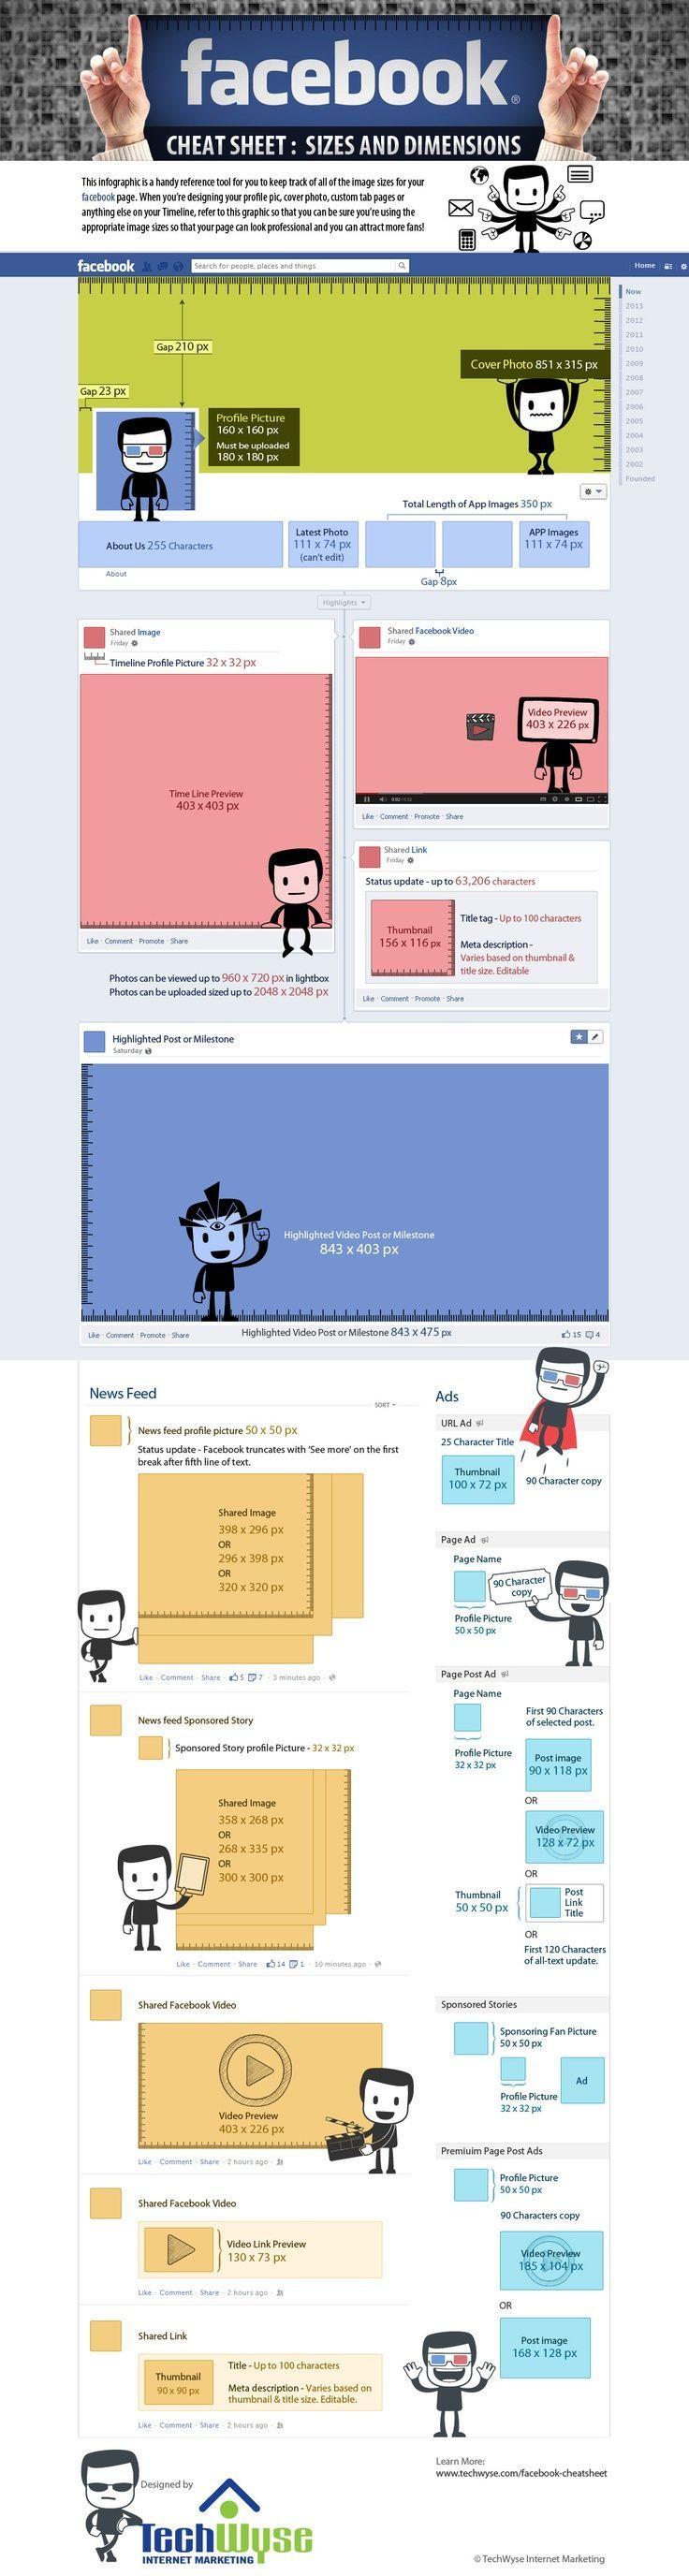 82 best Facebook Infographics images on Pinterest | Business checks ...